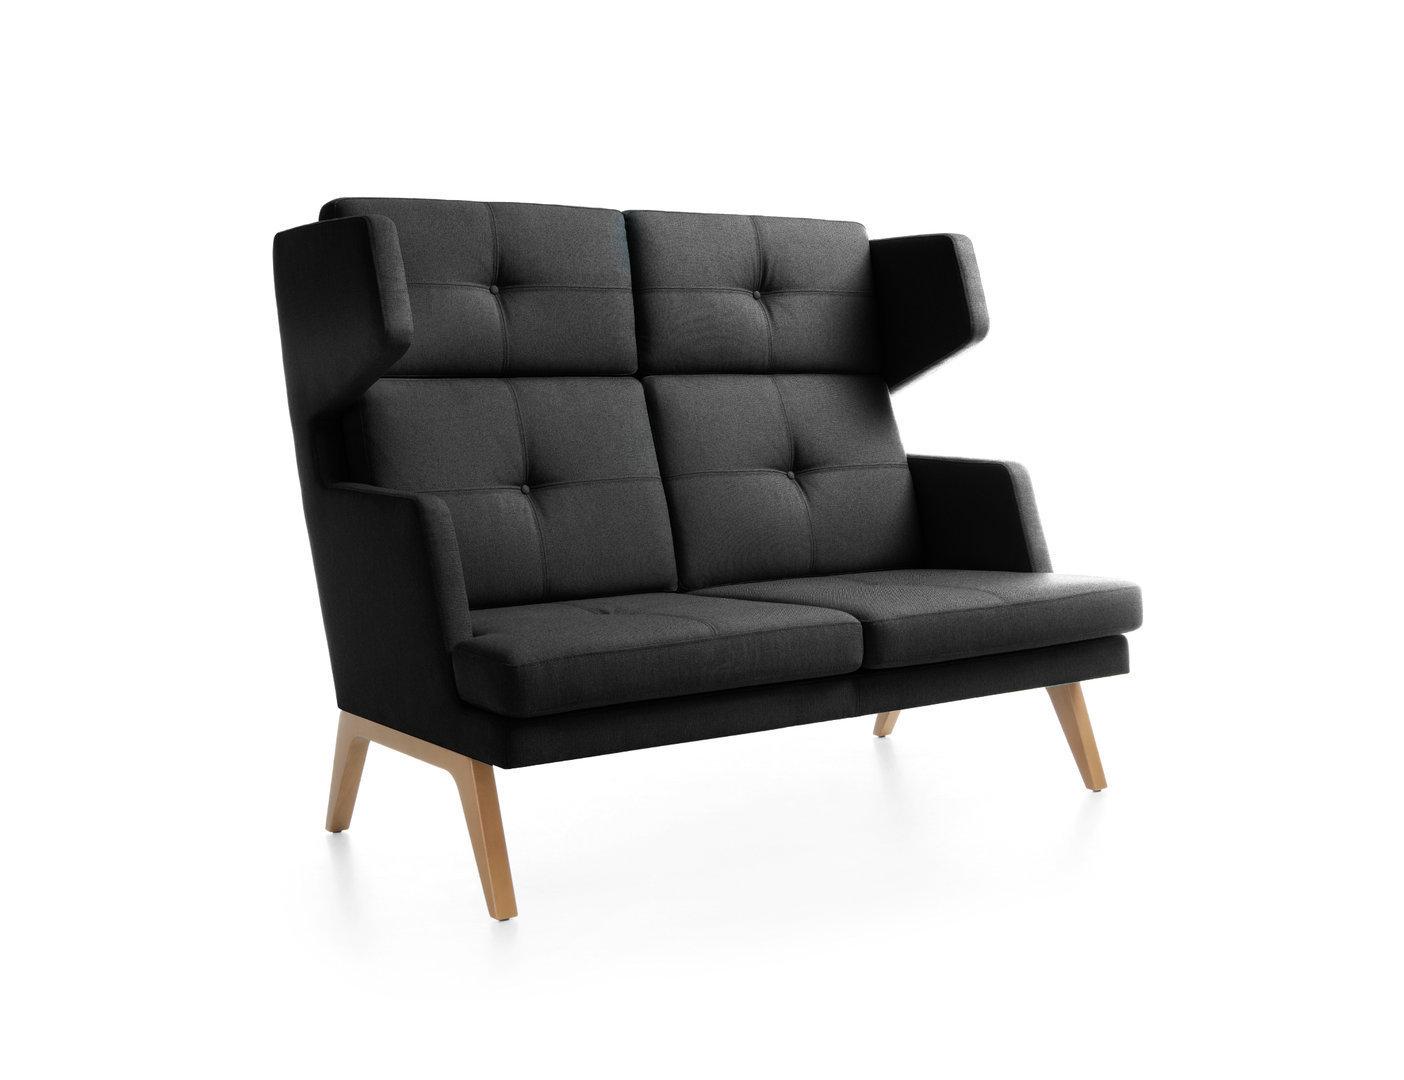 zweisitzer sessel october 22 designm bel online kaufen buerado designshop. Black Bedroom Furniture Sets. Home Design Ideas